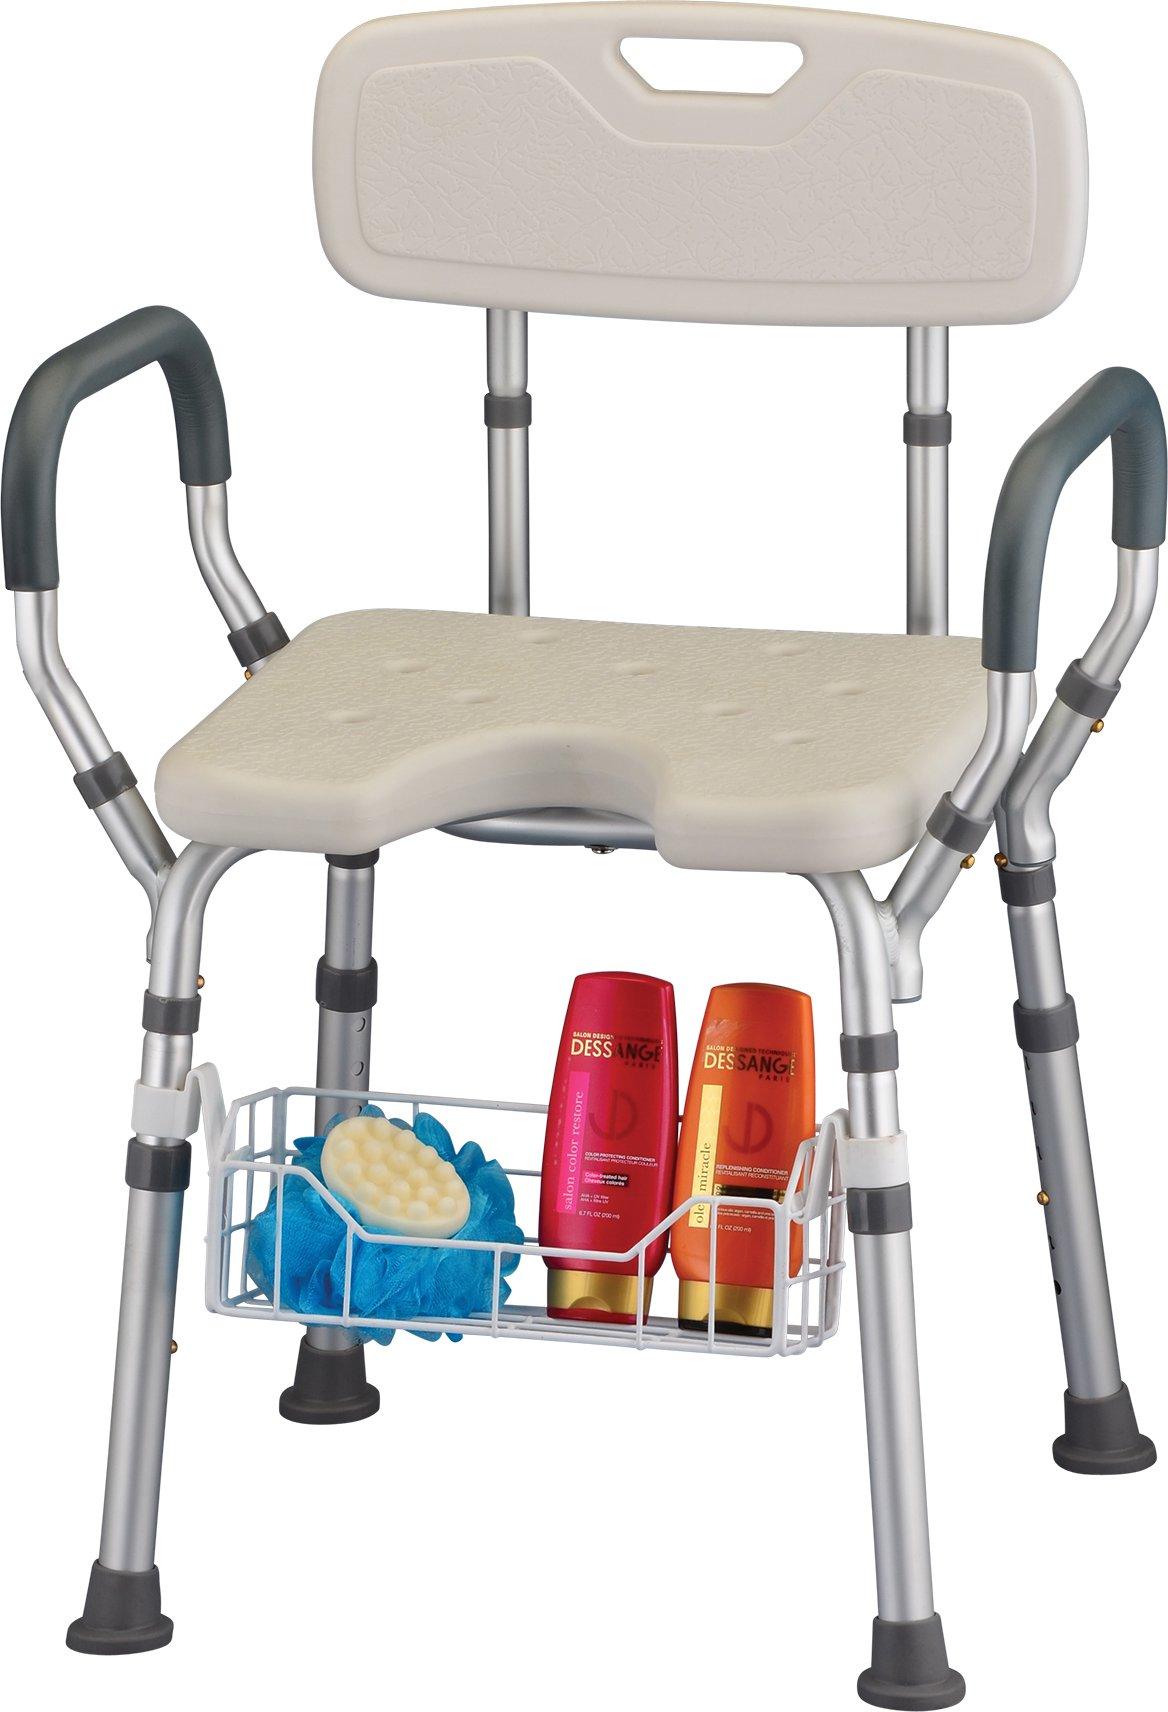 NOVA Medical Products Bath Seat Basket, White, 1 Pound